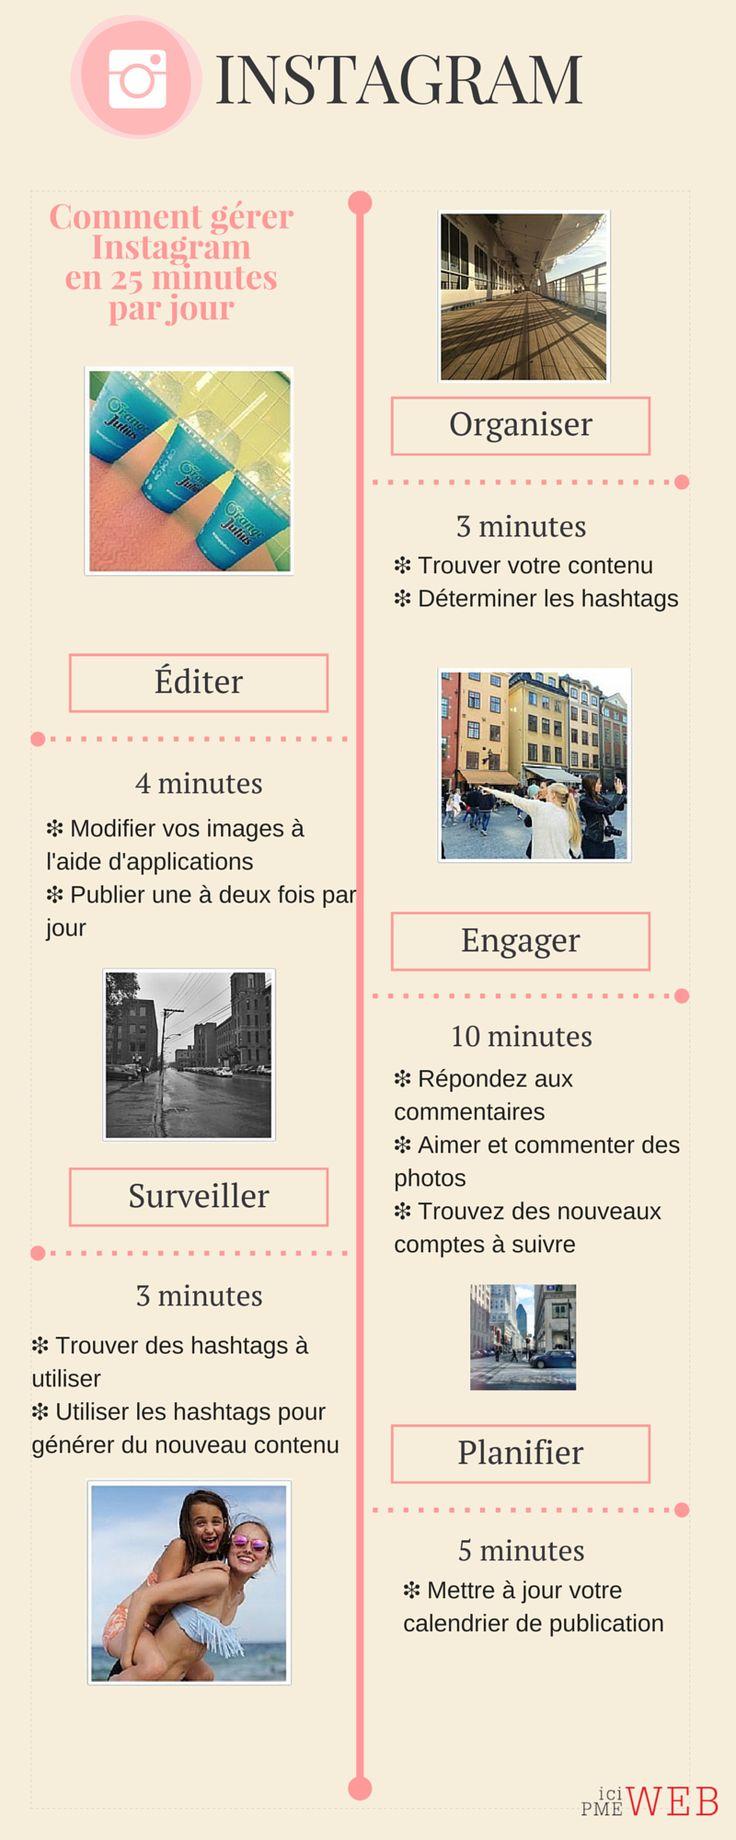 Organiser vos publications sur #Instagram via @icipmeweb #marketing #socialmedia #mediassociaux #reseauxsociaux